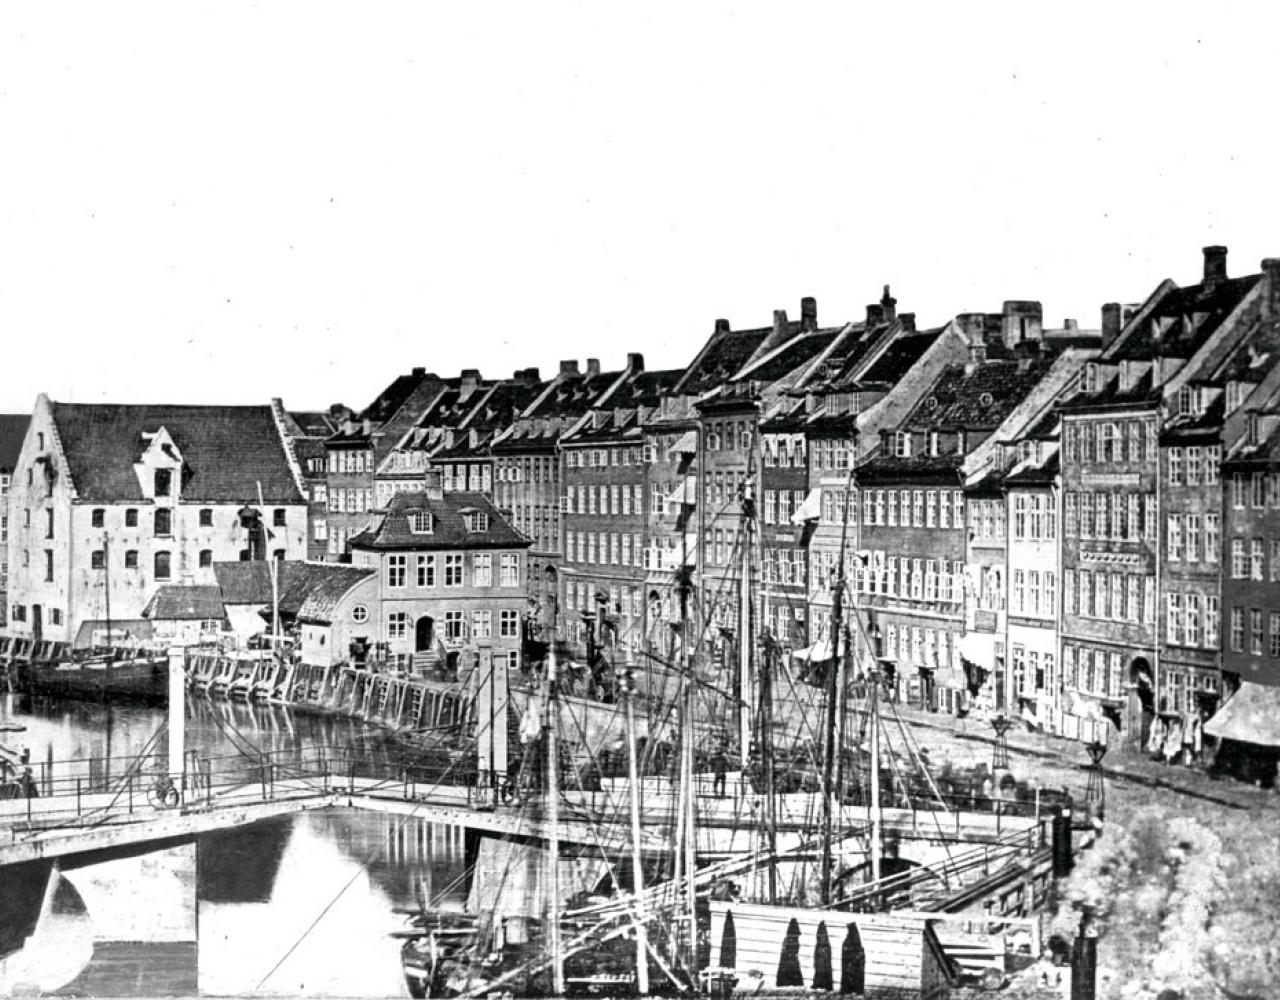 Ещё одно старейшее фото Копенгагена, 1840 г.